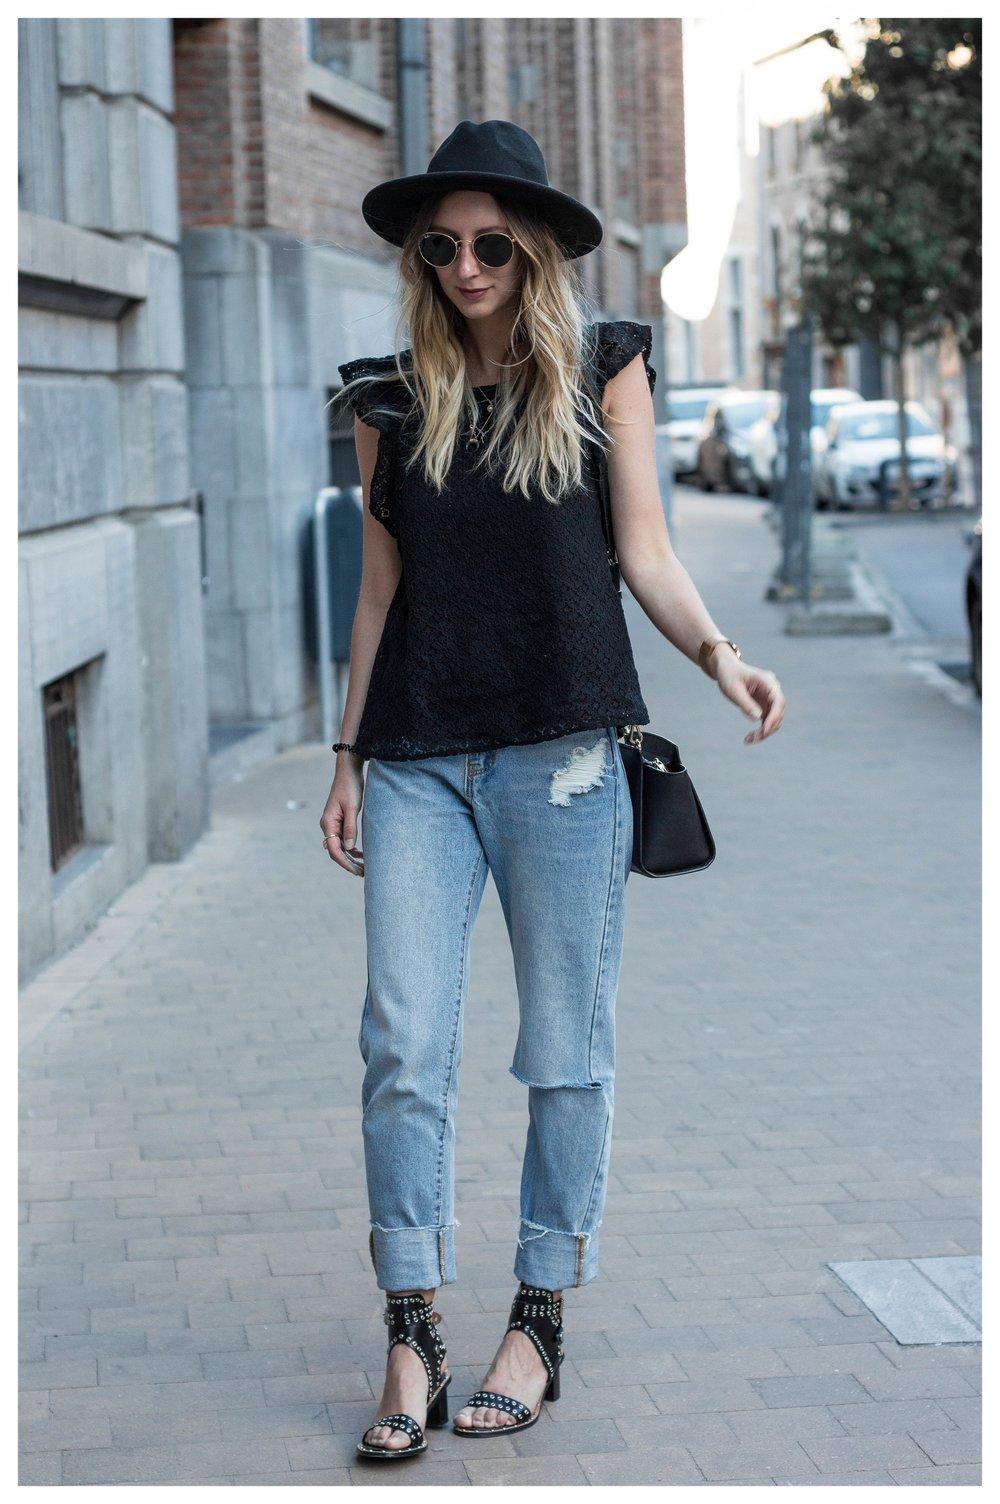 Street Style Namur - OSIARAH.COM (15 of 19).jpg